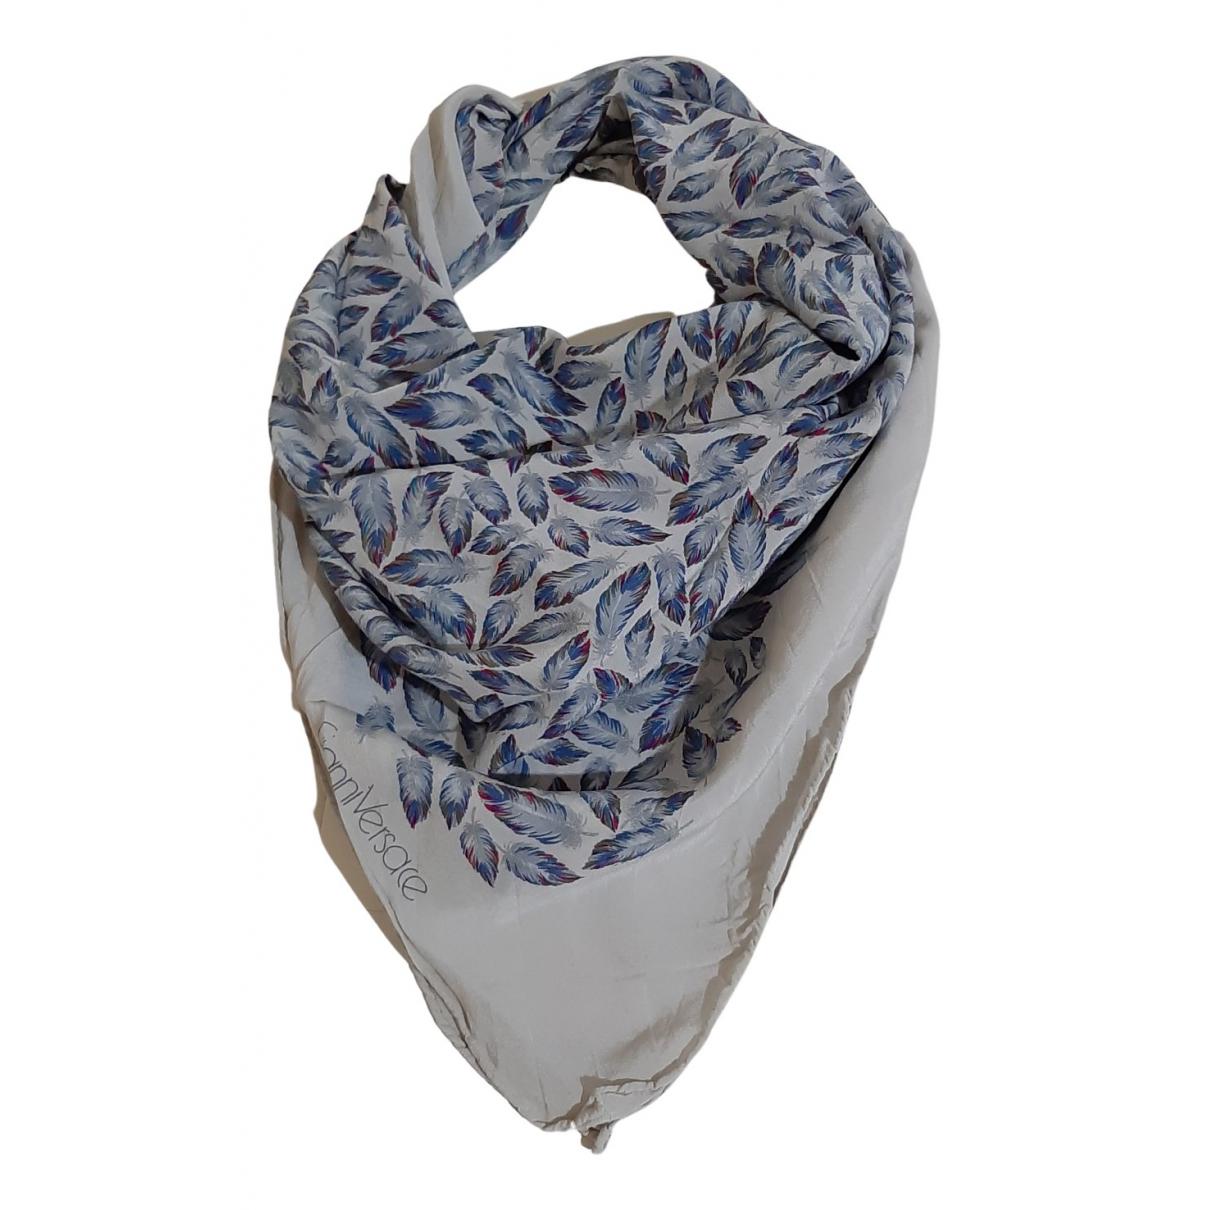 Gianni Versace N Blue Silk scarf for Women N